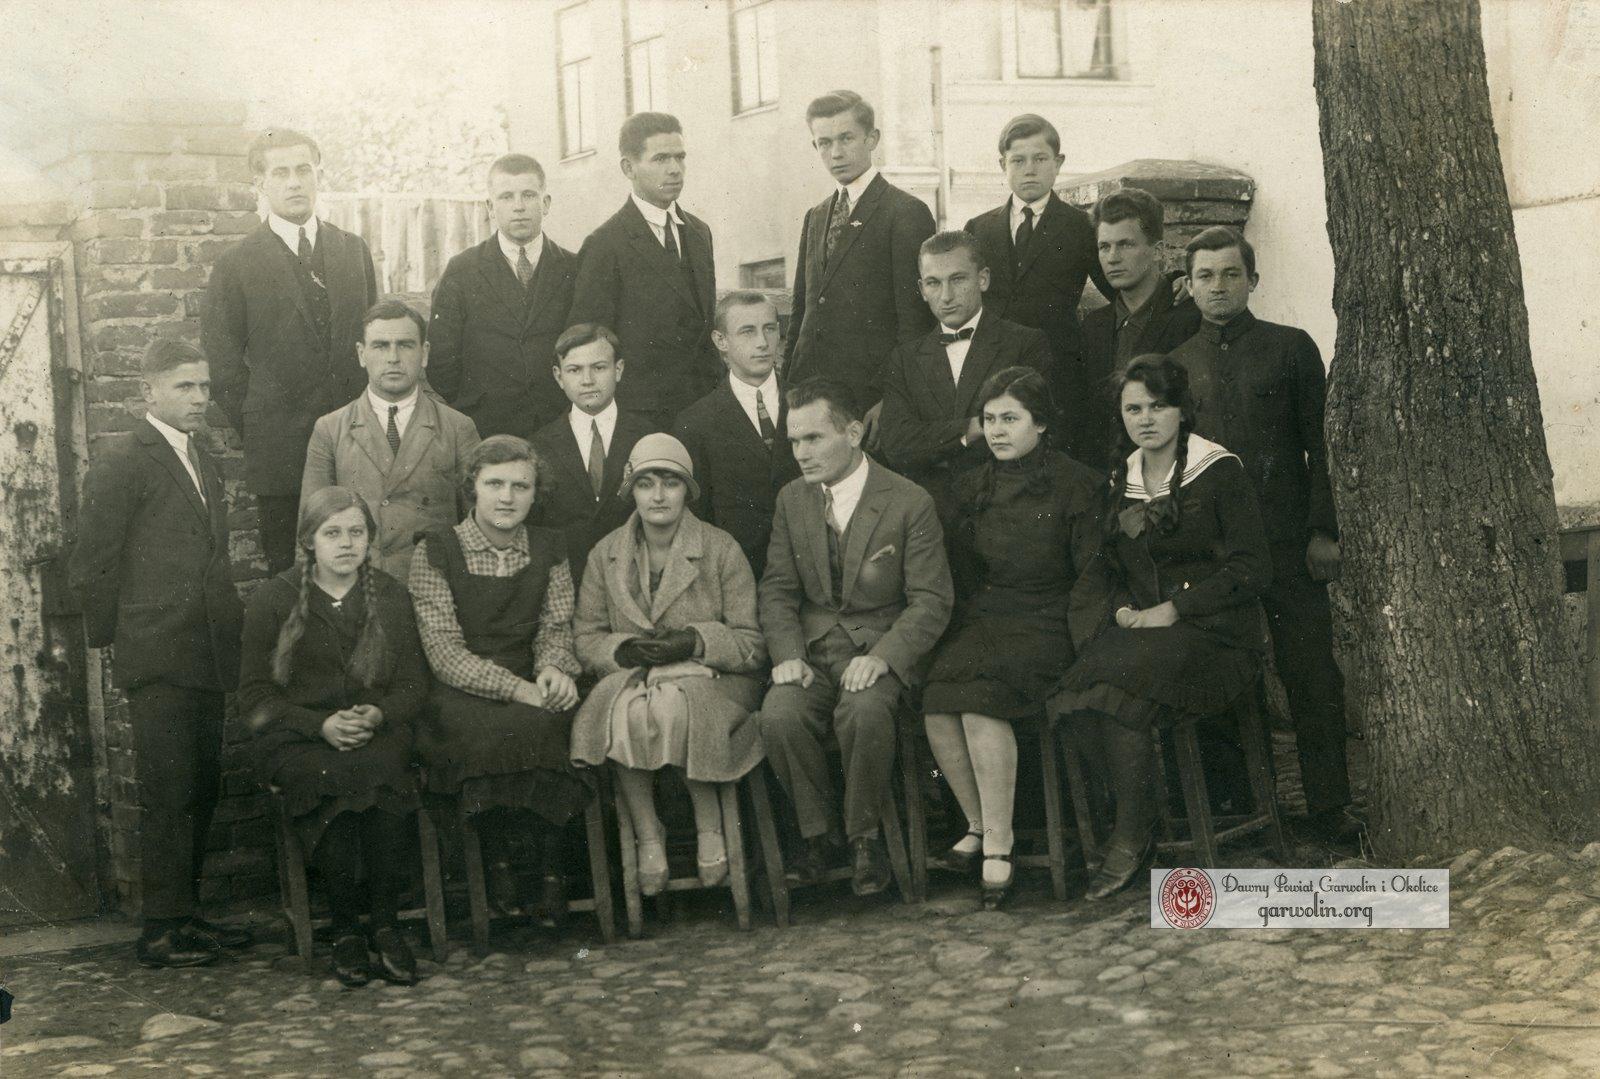 Szkoła Powszechna kl VIII 1927/28